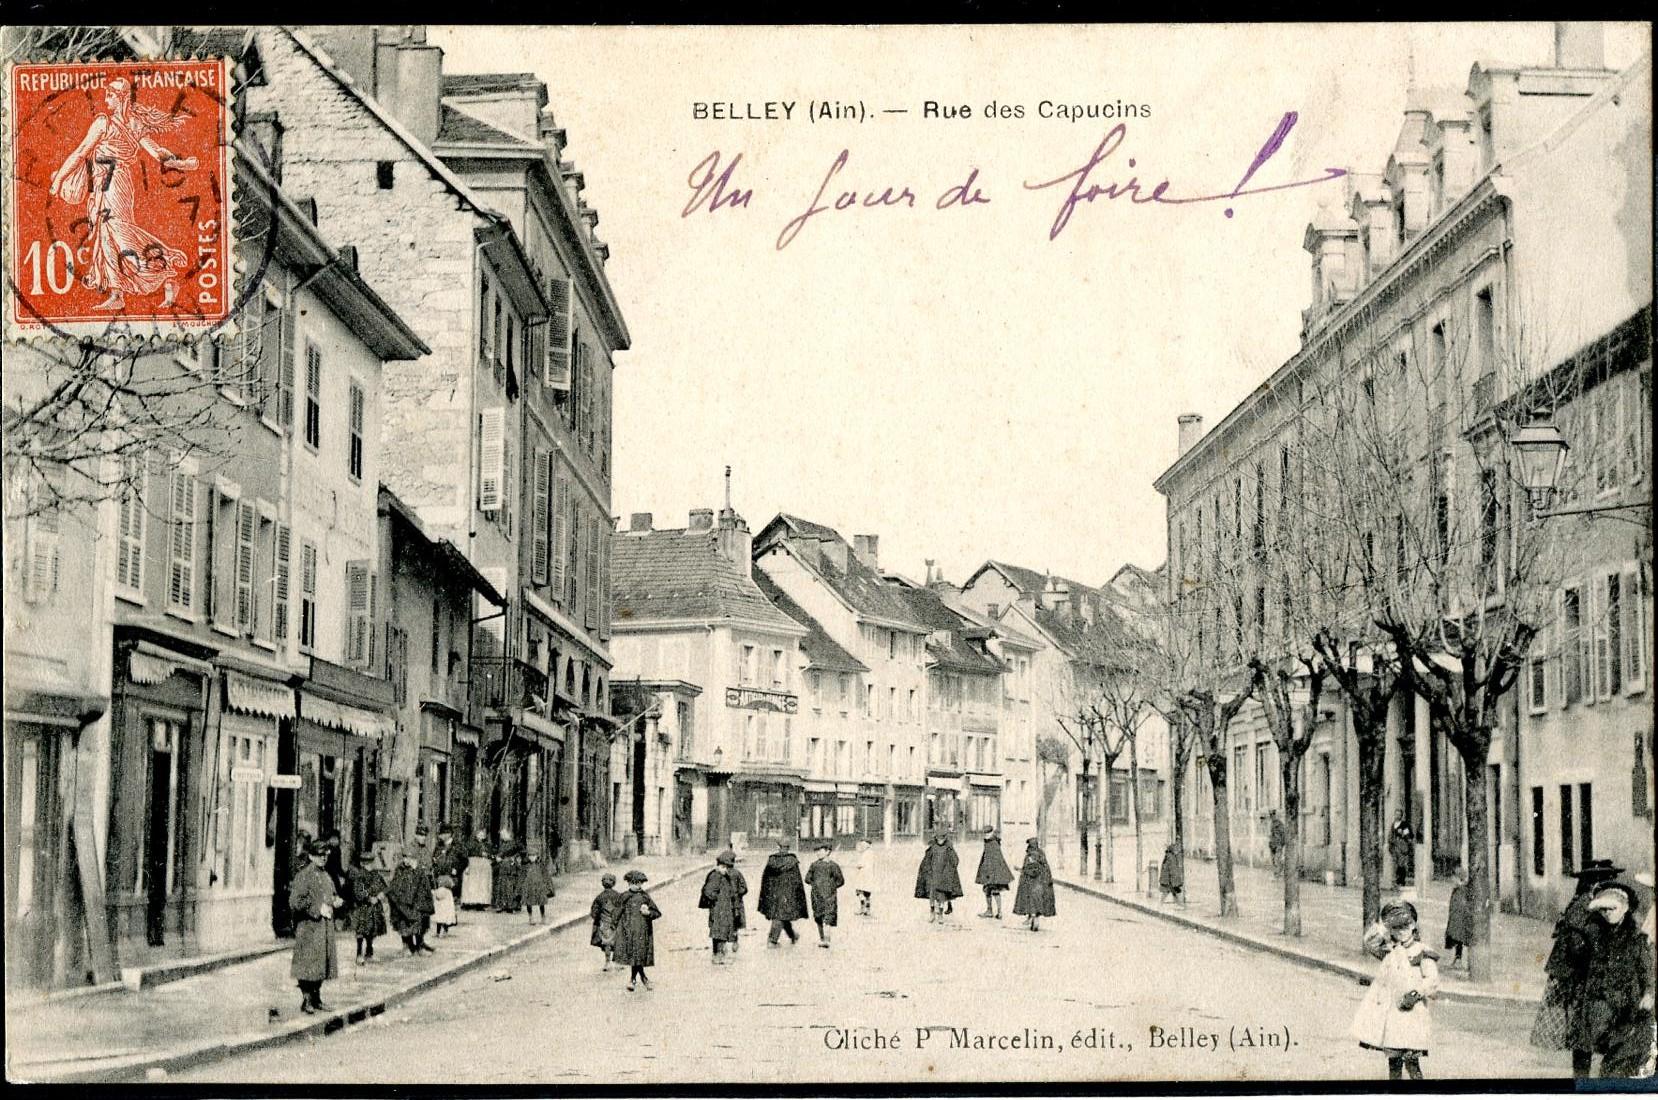 https://www.caen-numisma-or-et-argent.com/images/Image/belley-rue-des-capucins-n-165.jpg